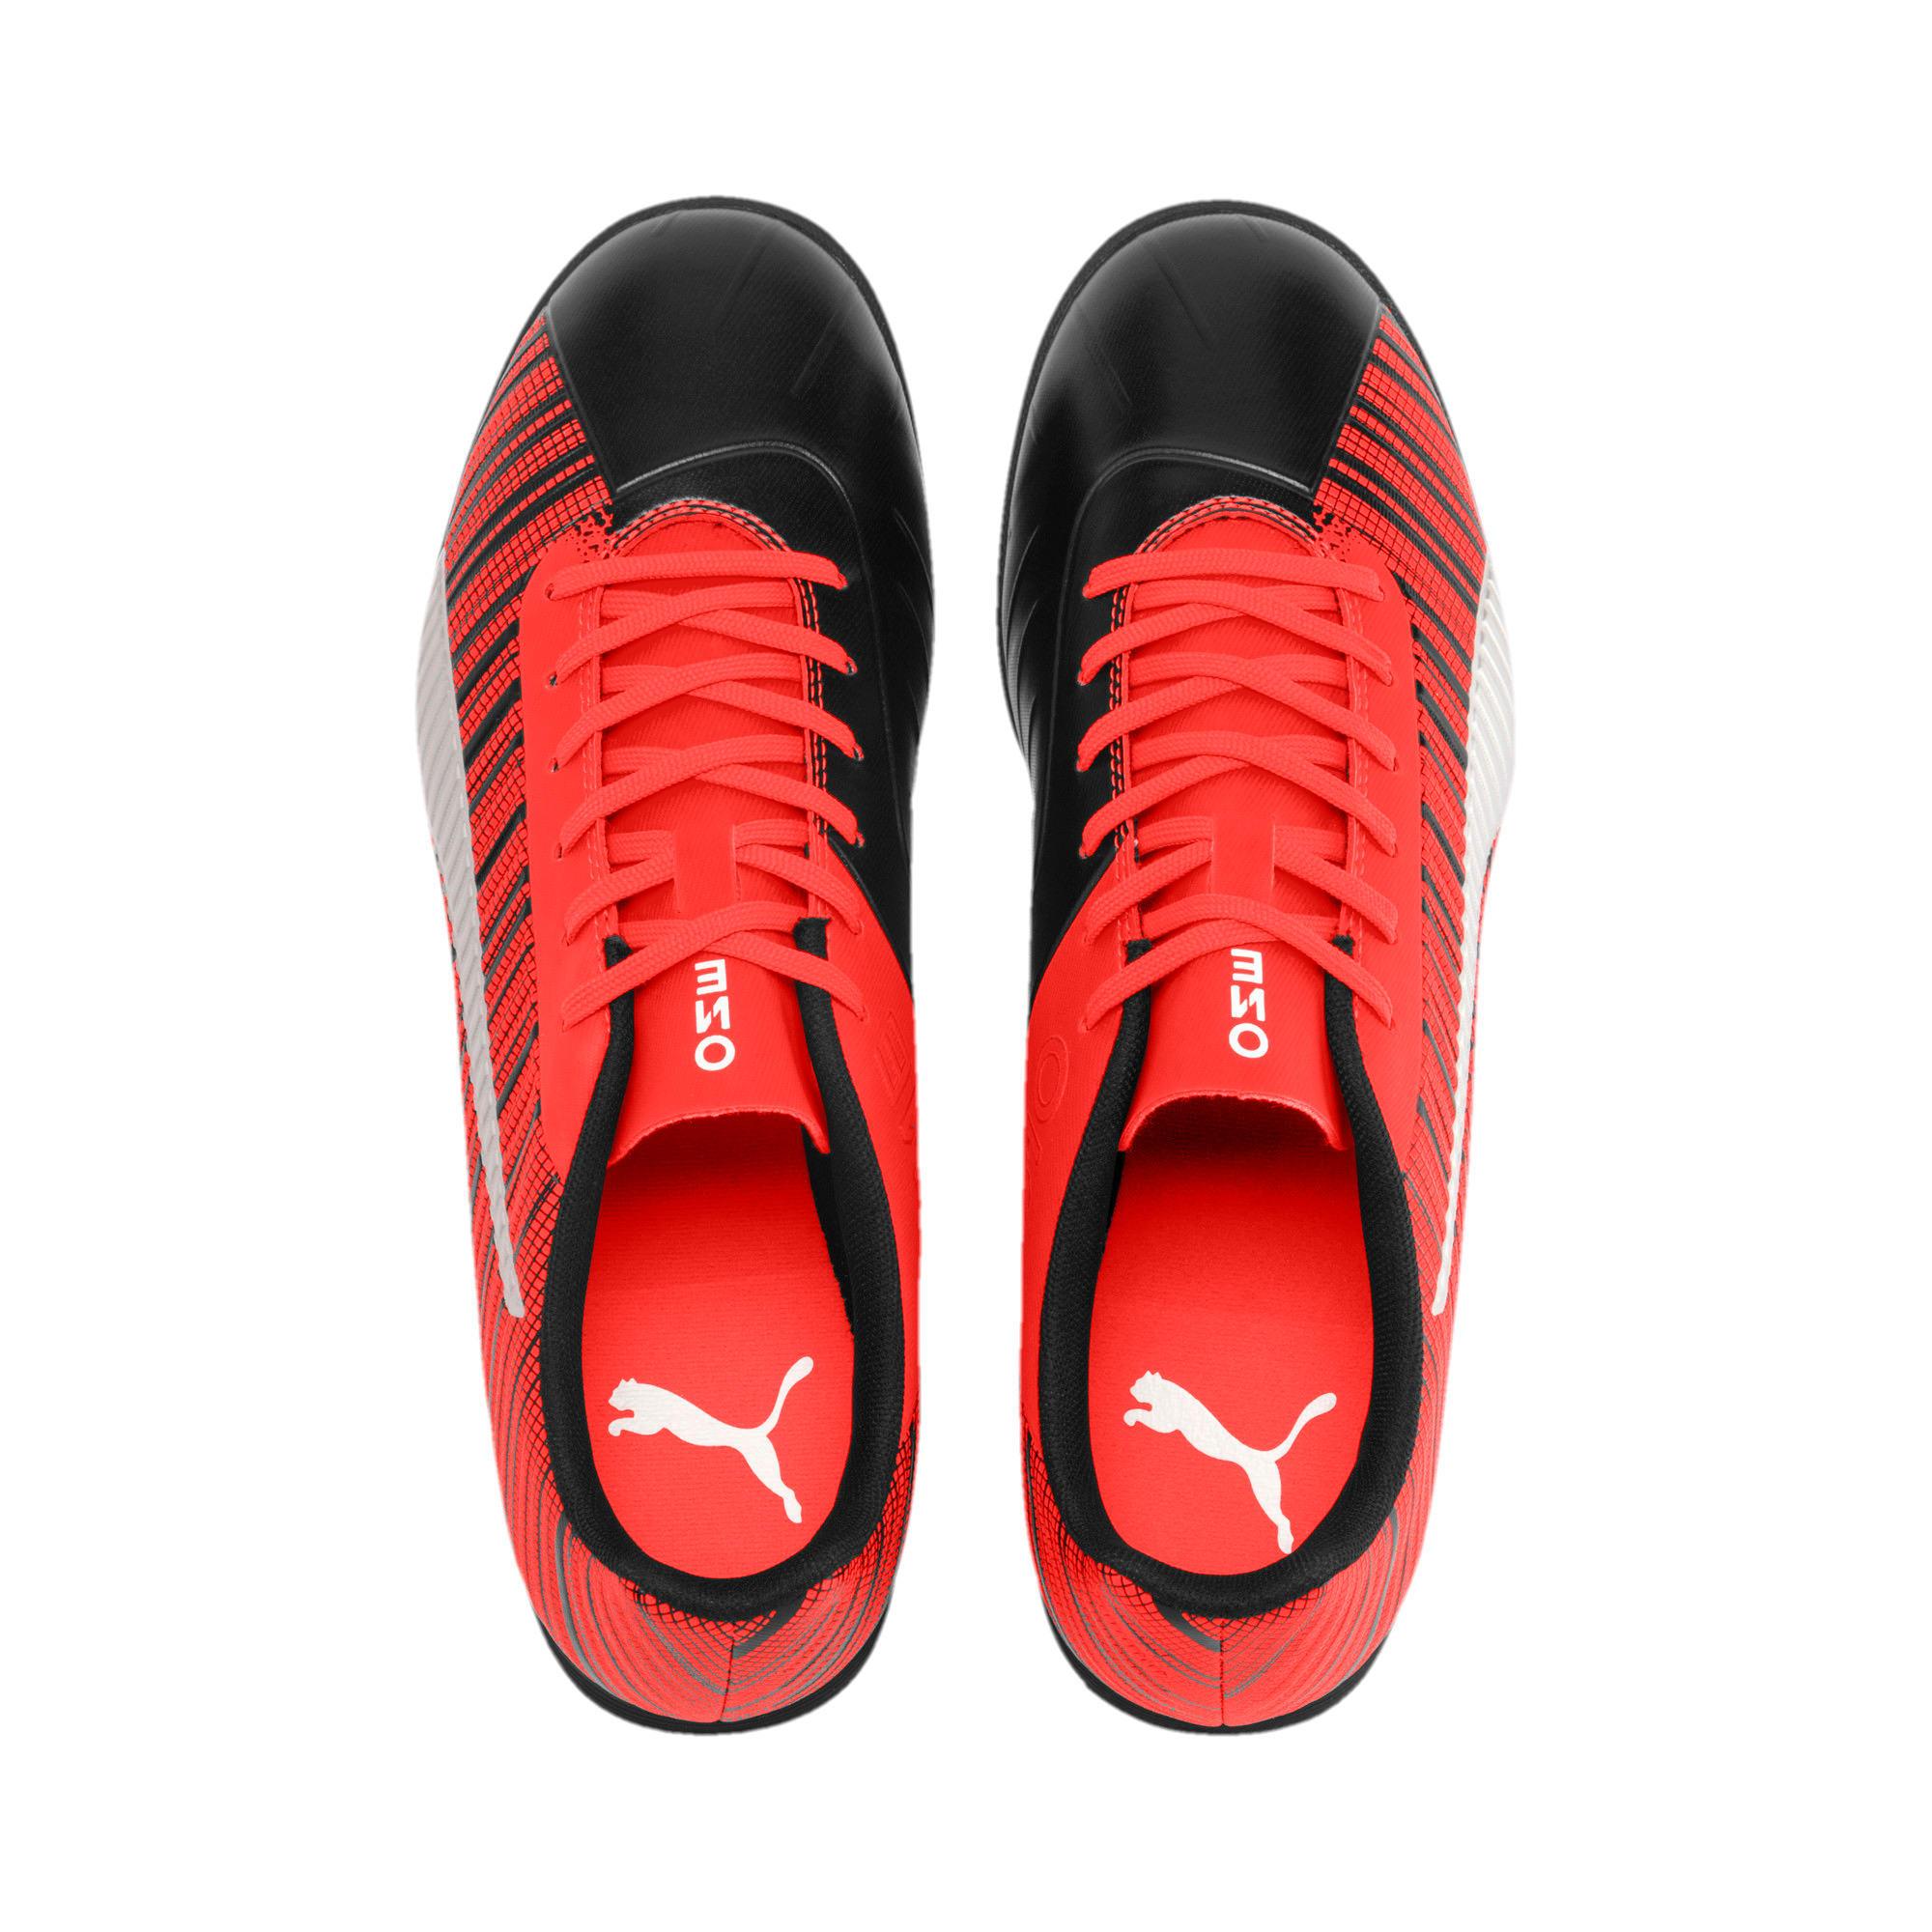 Thumbnail 7 of PUMA ONE 5.4 TT Men's Football Boots, Black-Nrgy Red-Aged Silver, medium